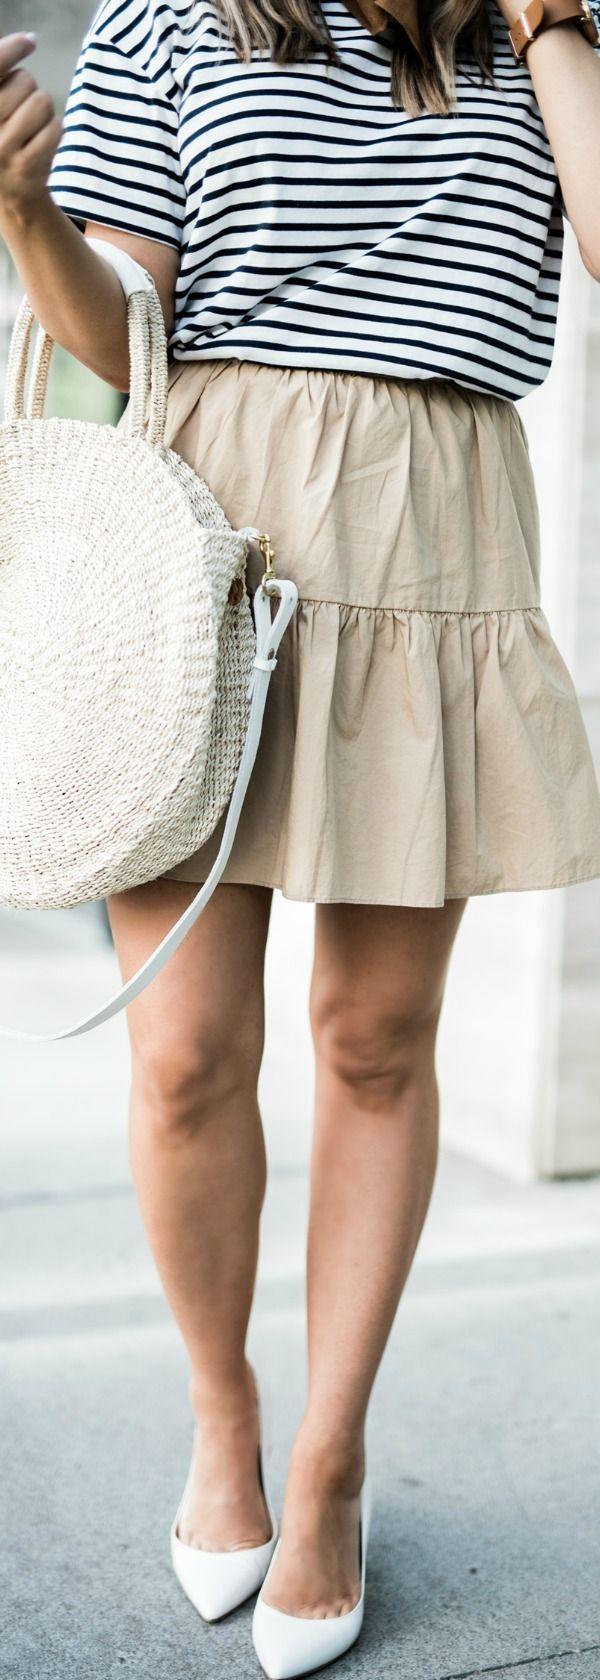 Tiffany Jais Houston fashion and lifestyle blogger | circle straw tote, ruffle hem skirt, casual summer outfits, street style 2017, white block heels, bandana outfits, clare v alice tote, white heels outfit ideas, circle straw tote